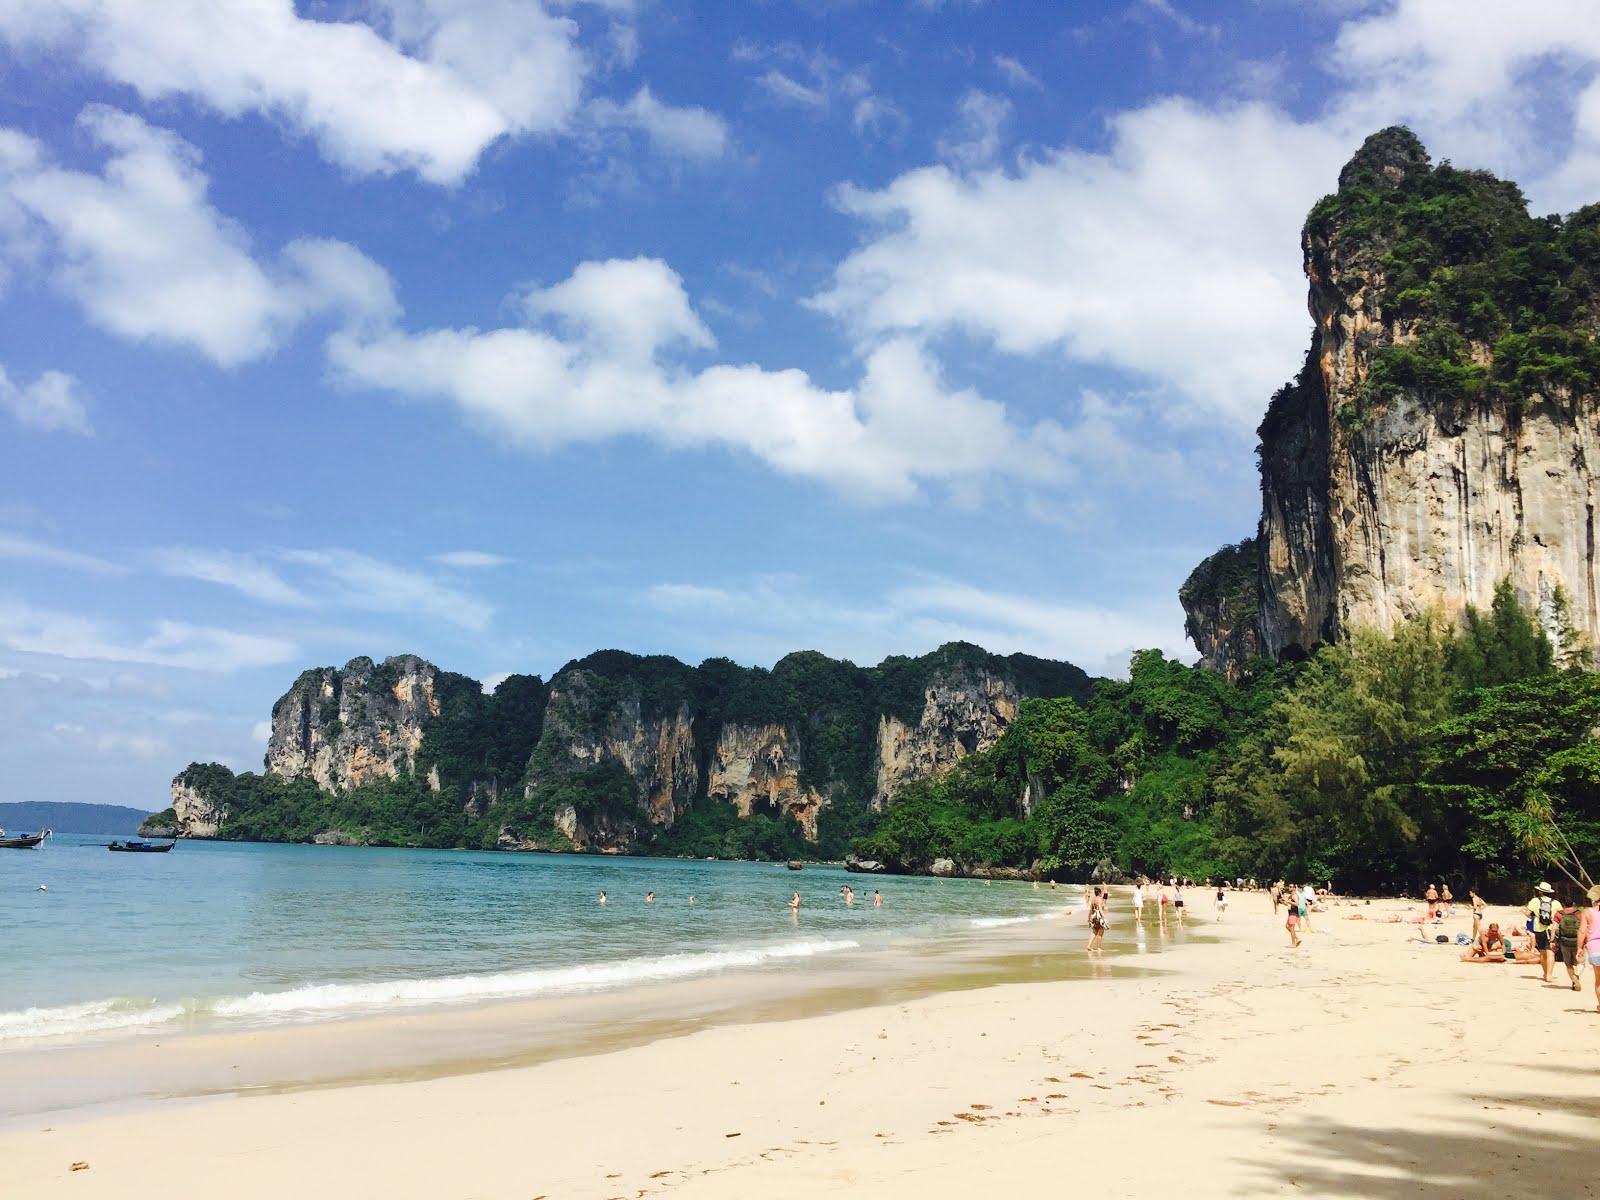 Railay Bay in Krabi, Thailand